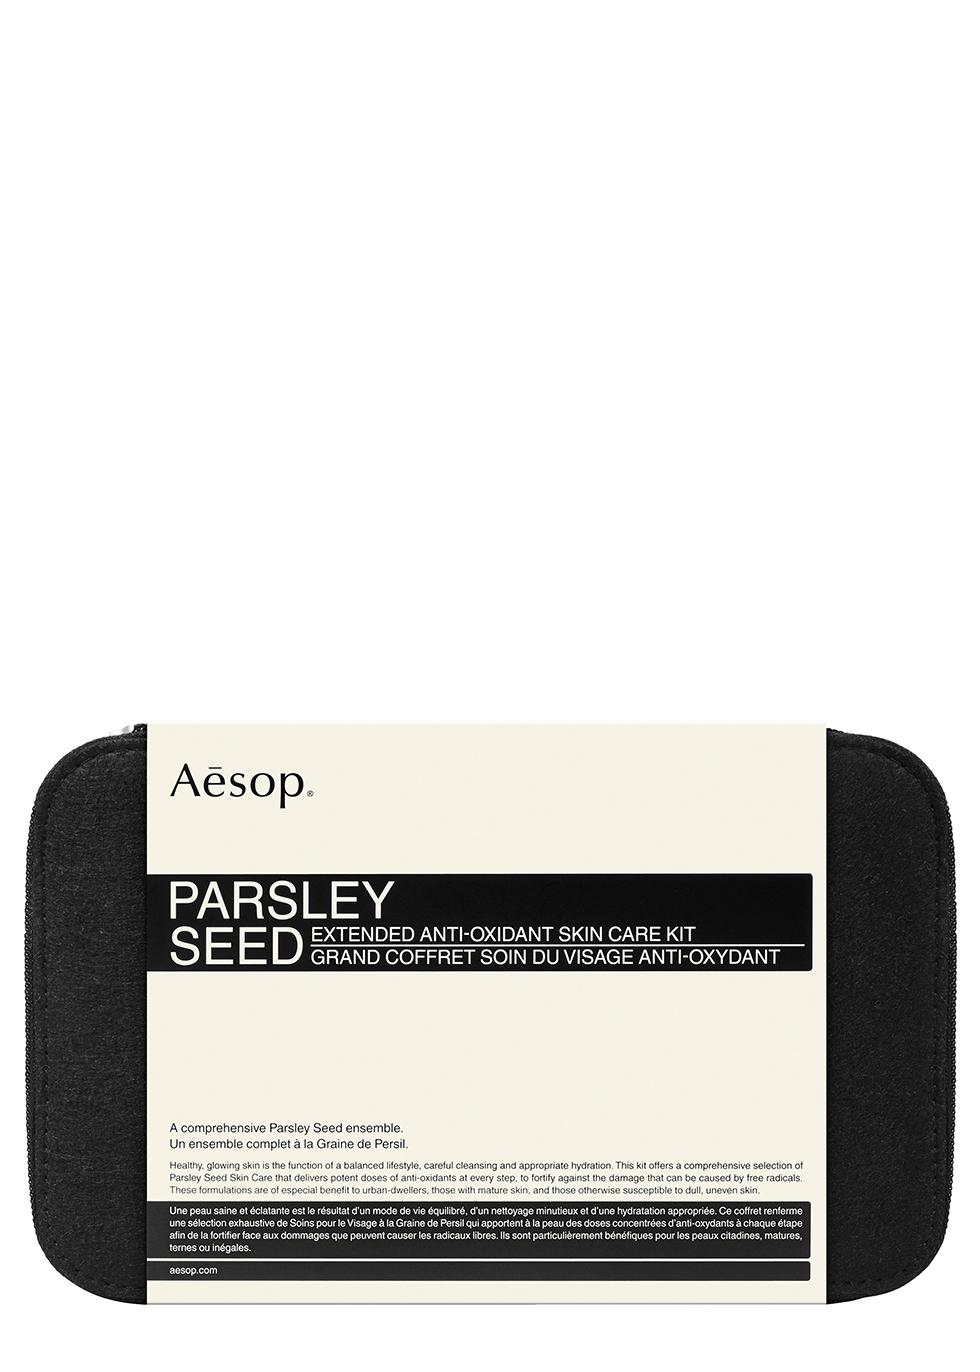 Parsley Seed Deluxe Kit